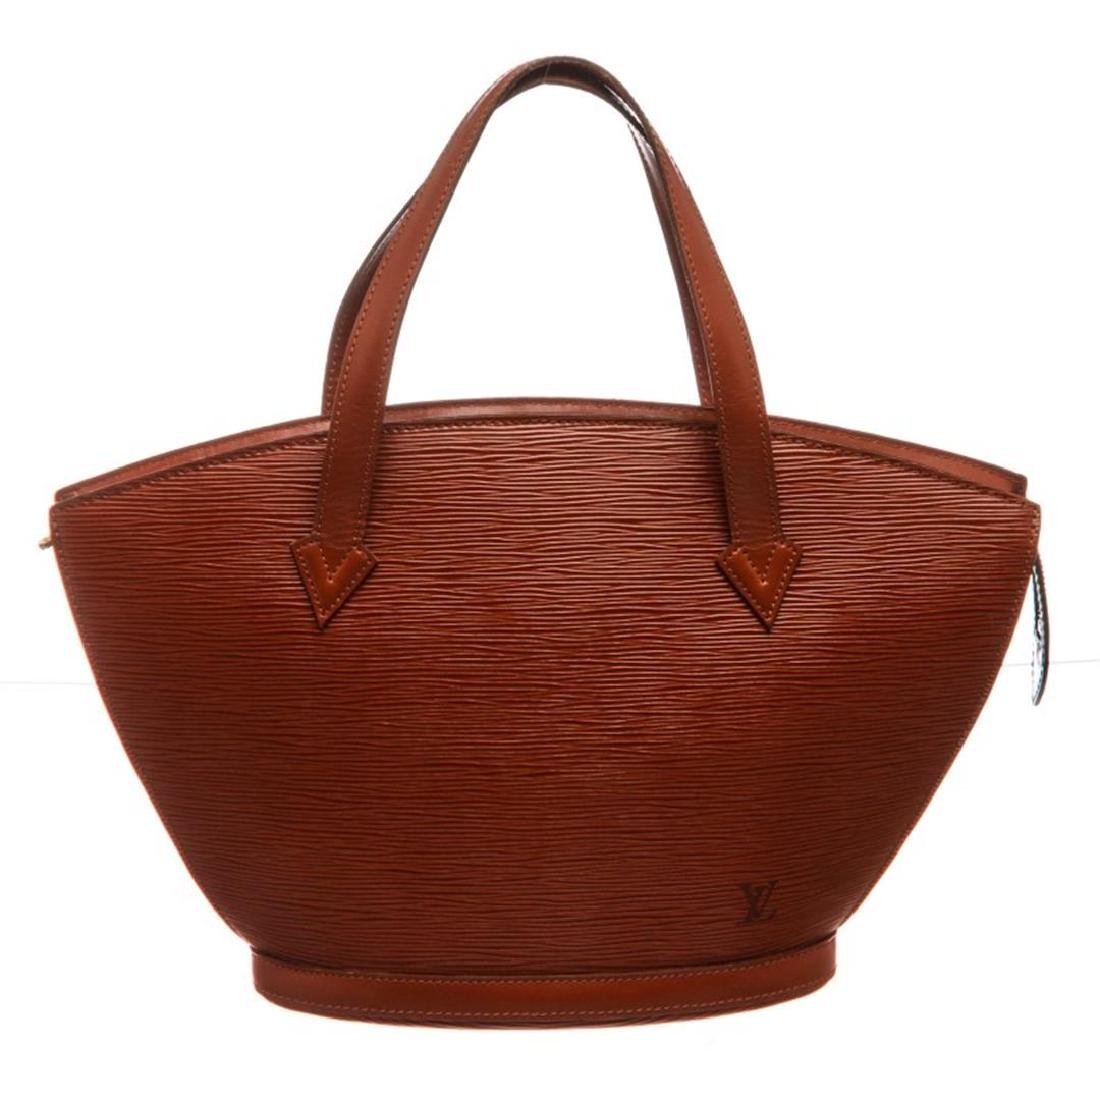 Louis Vuitton Sienna Brown Epi Leather St Jacques PM